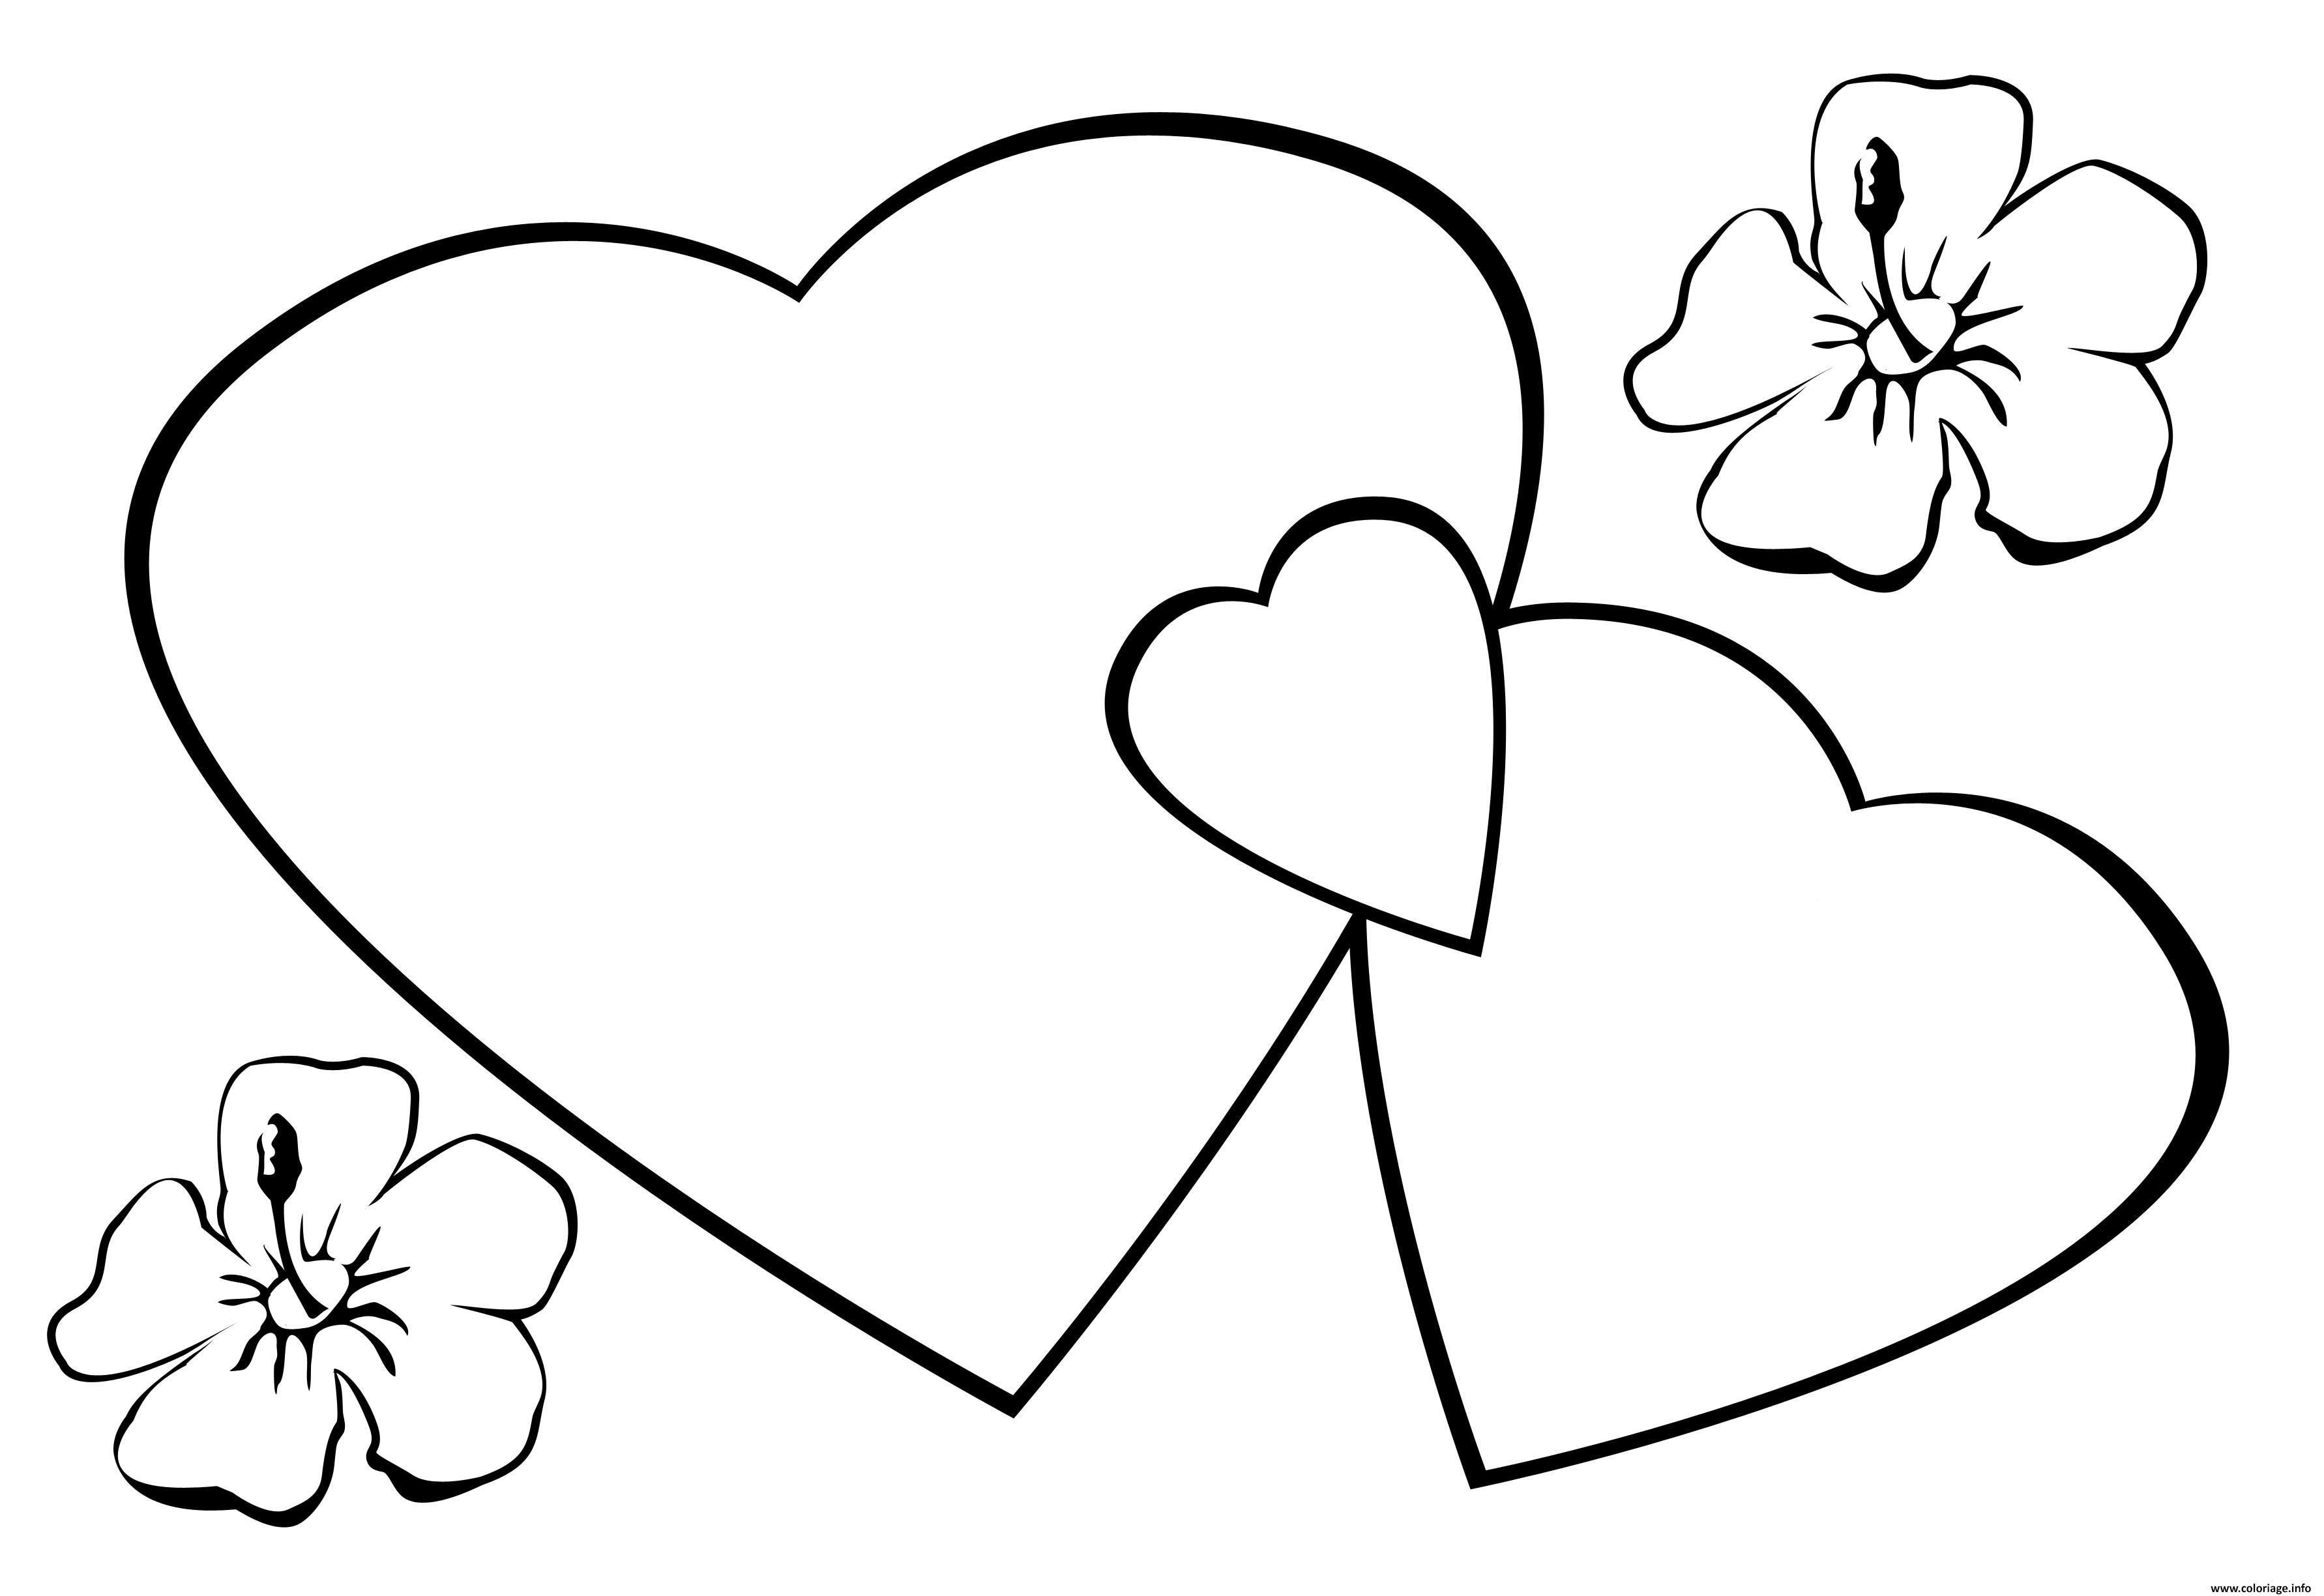 Coloriage coeurs st valentin fleurs dessin - St valentin dessin ...